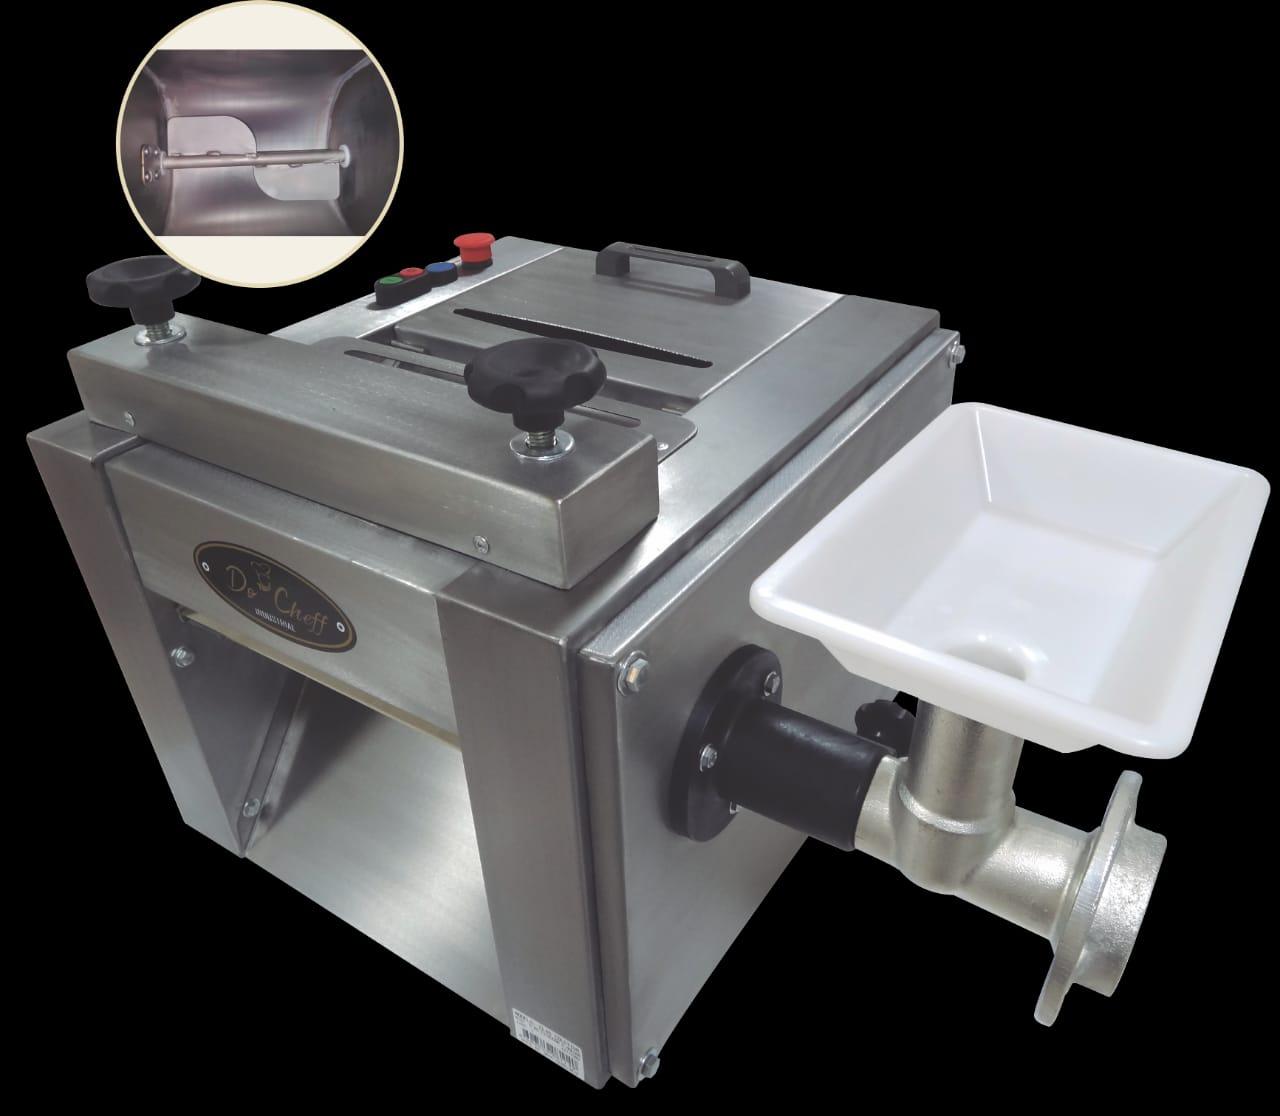 Cilindro Extrusor Moedor e Misturador CL 46 Total Inox Bivolt Do Cheff